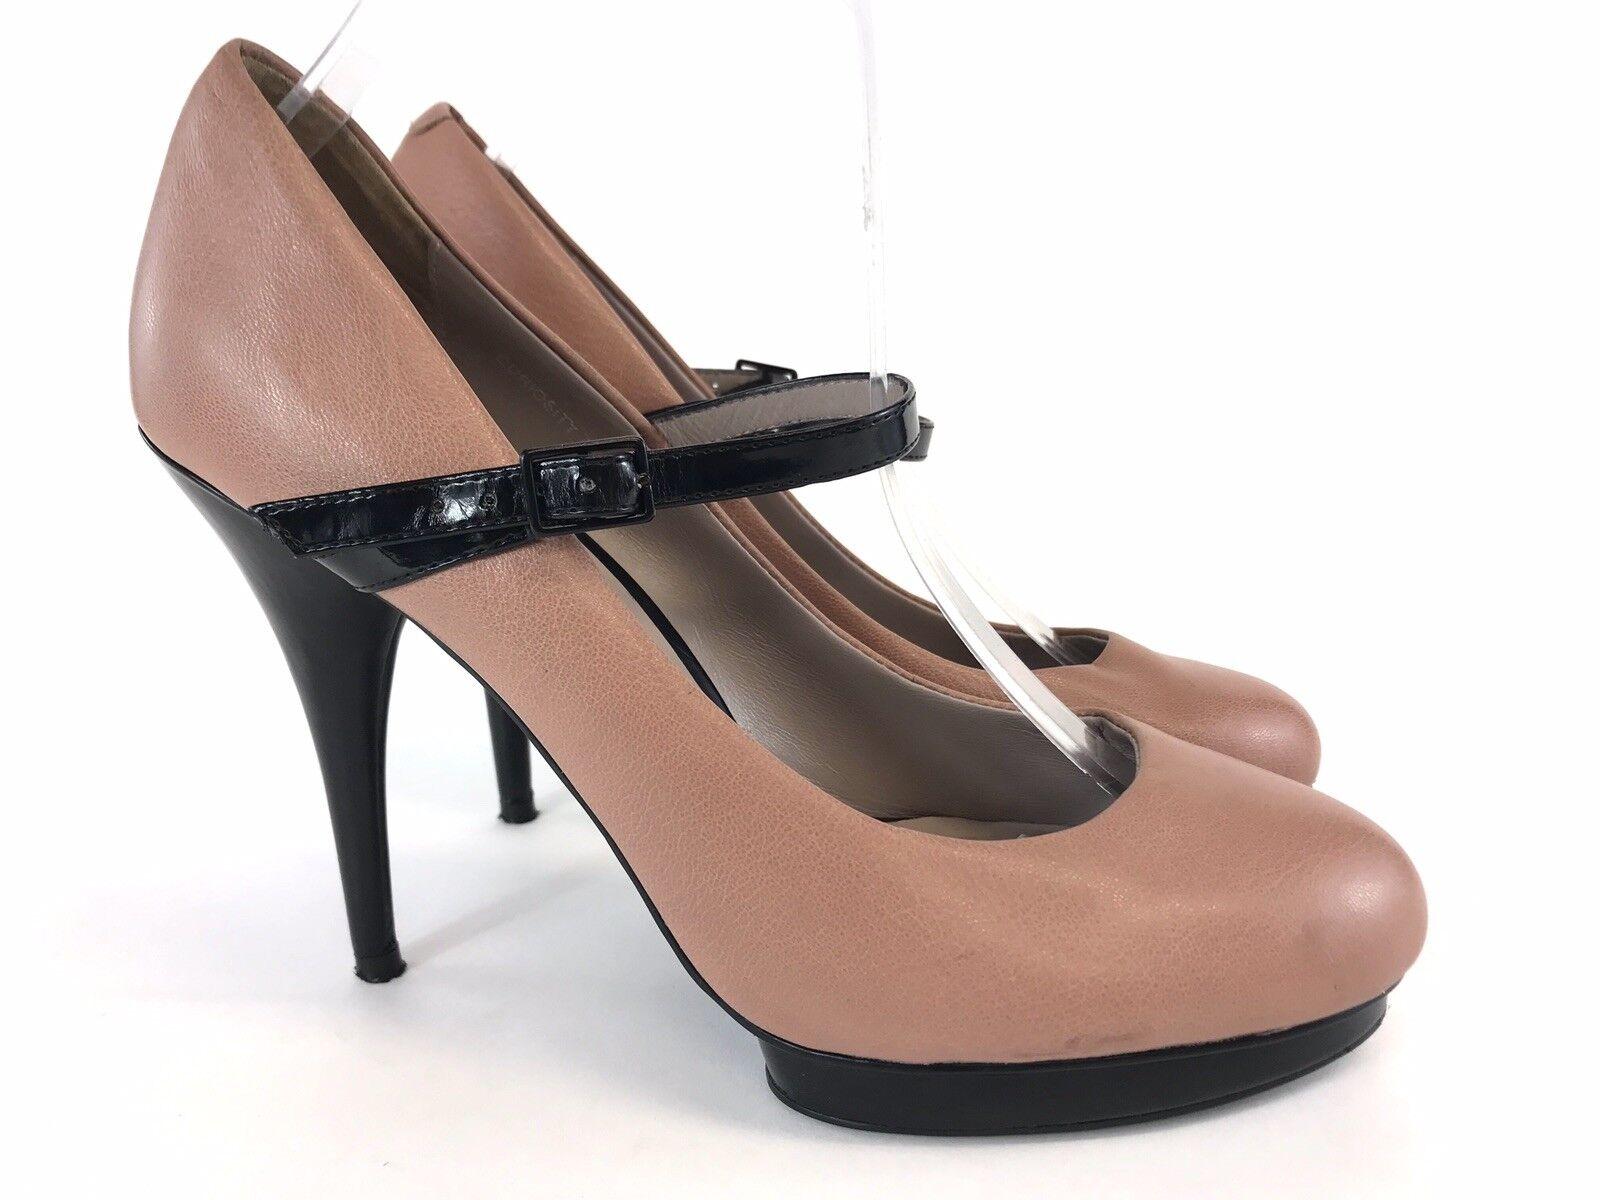 Jones Bootmaker Leather Mary Jane Court Heels shoes UK7 EU40 VGC Fast Shipping